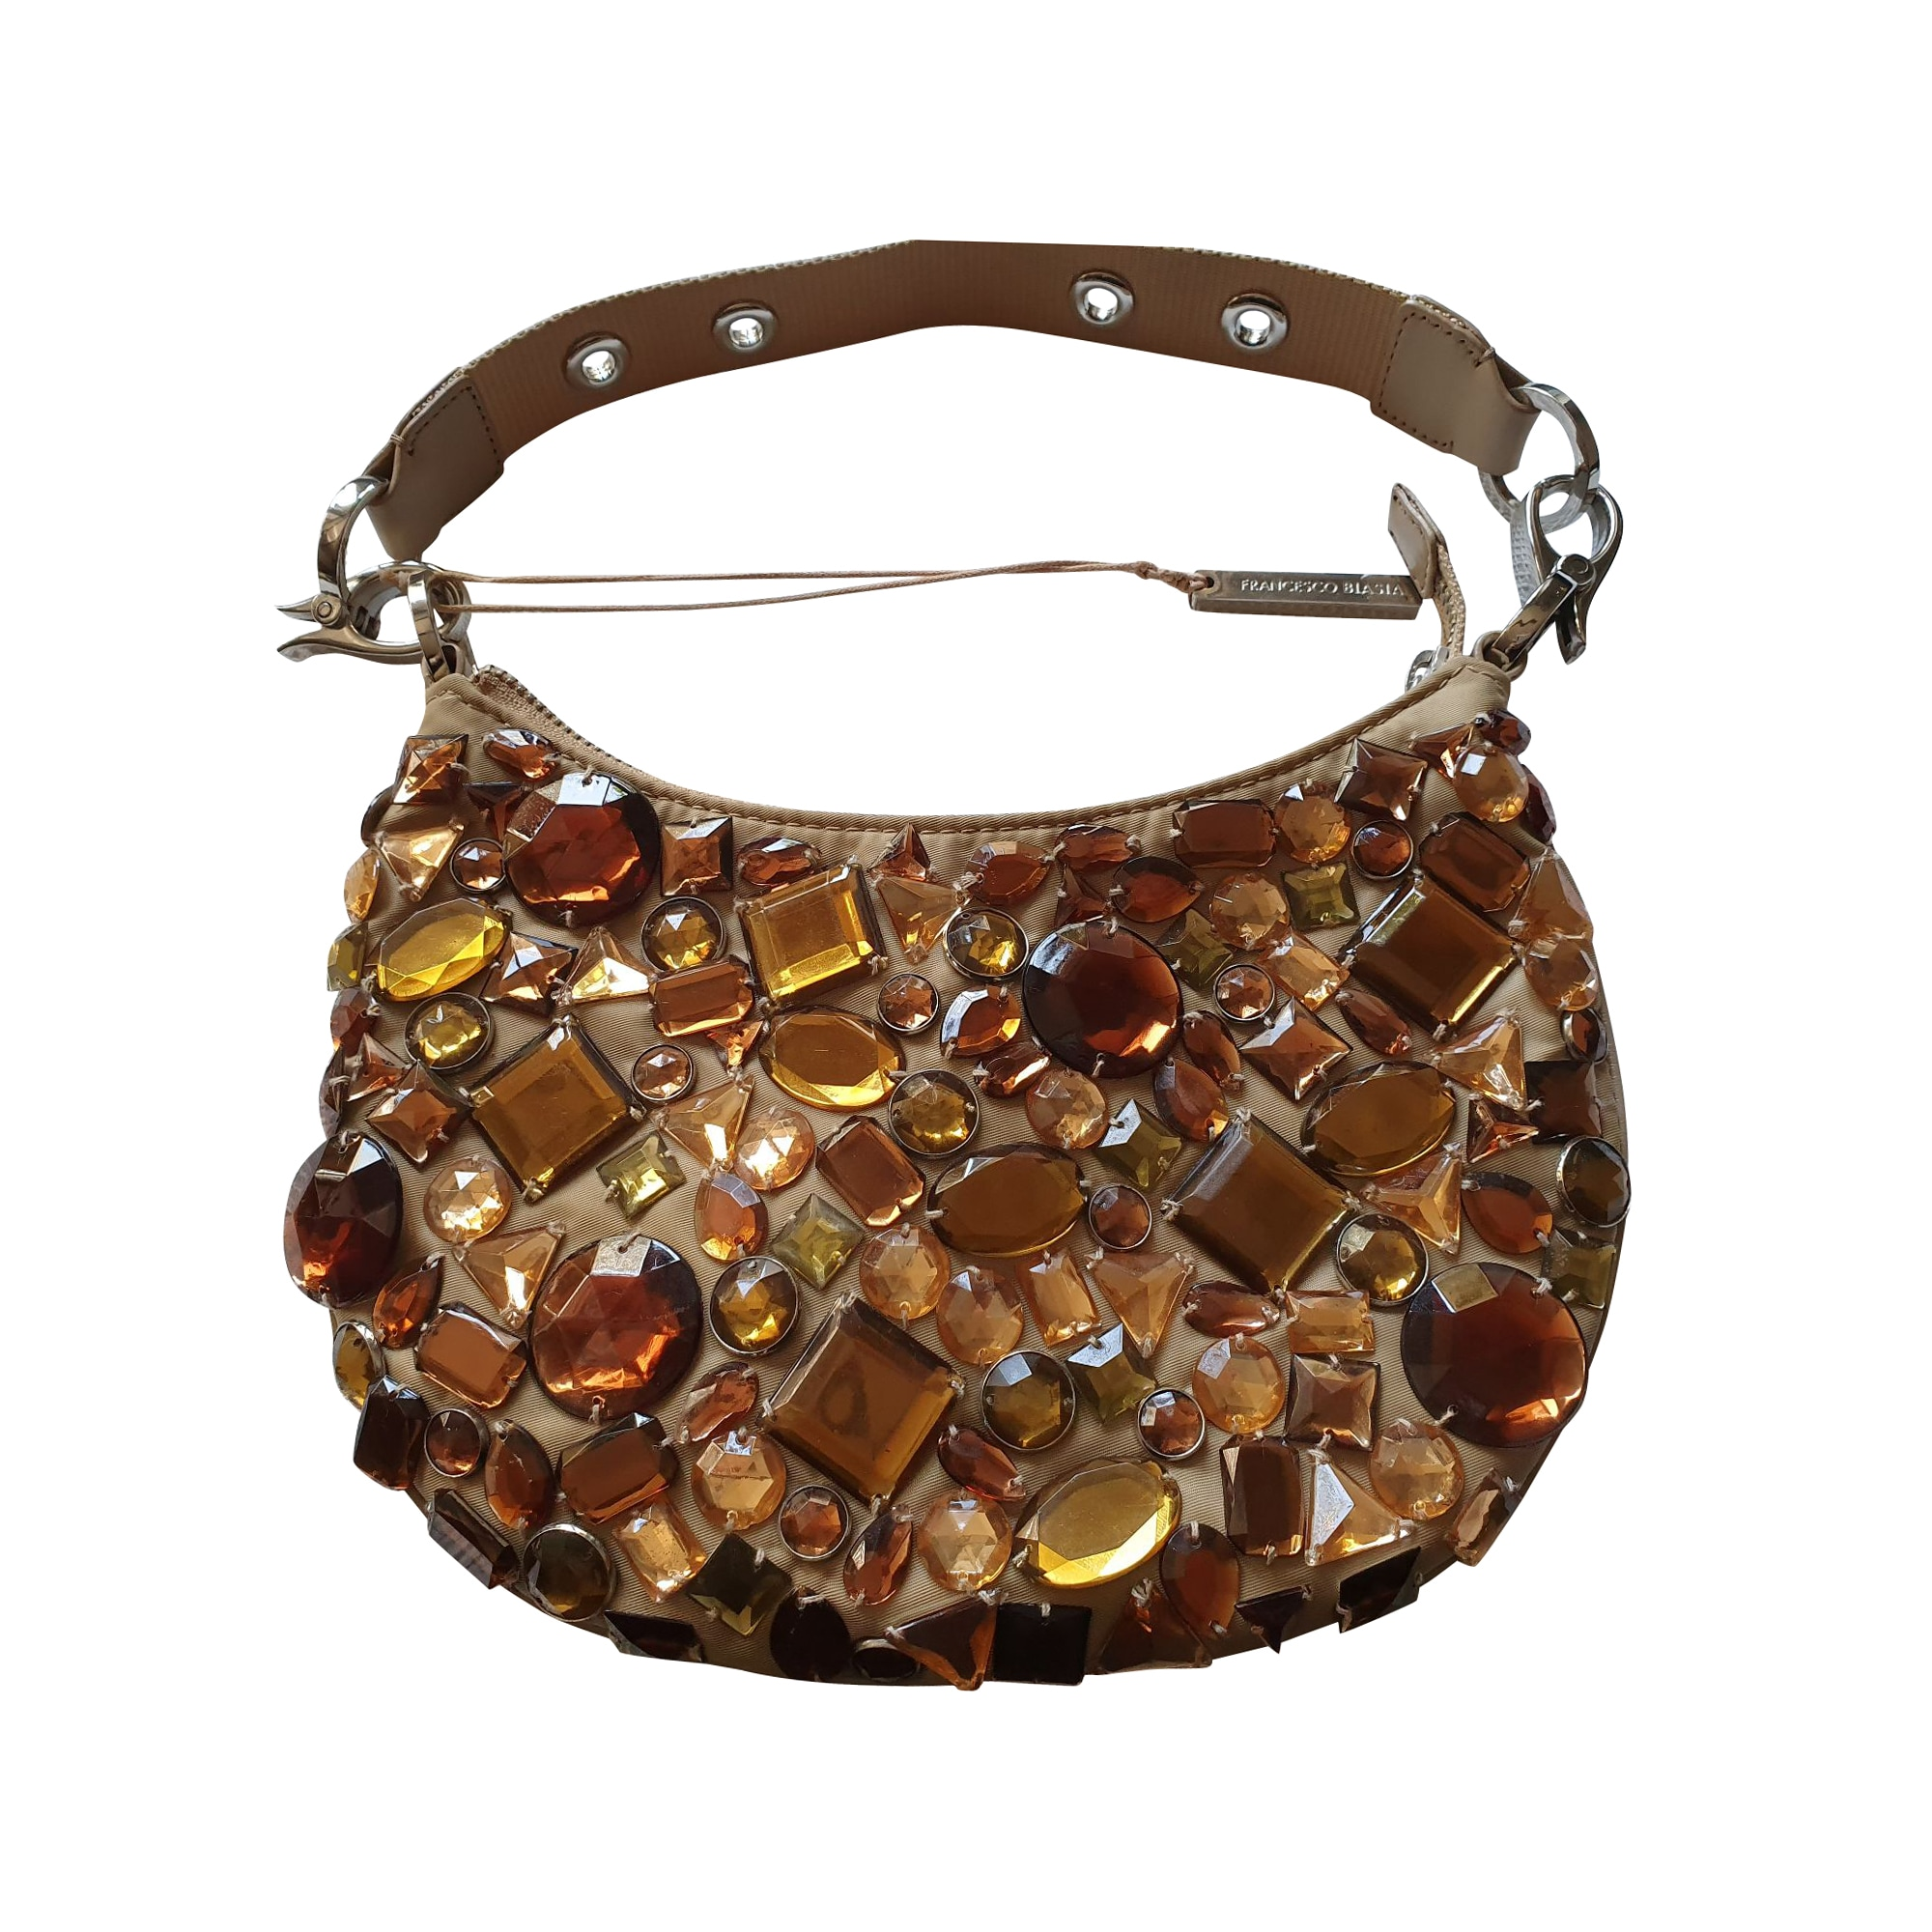 Sac pochette en tissu FRANCESCO BIASIA Doré, bronze, cuivre